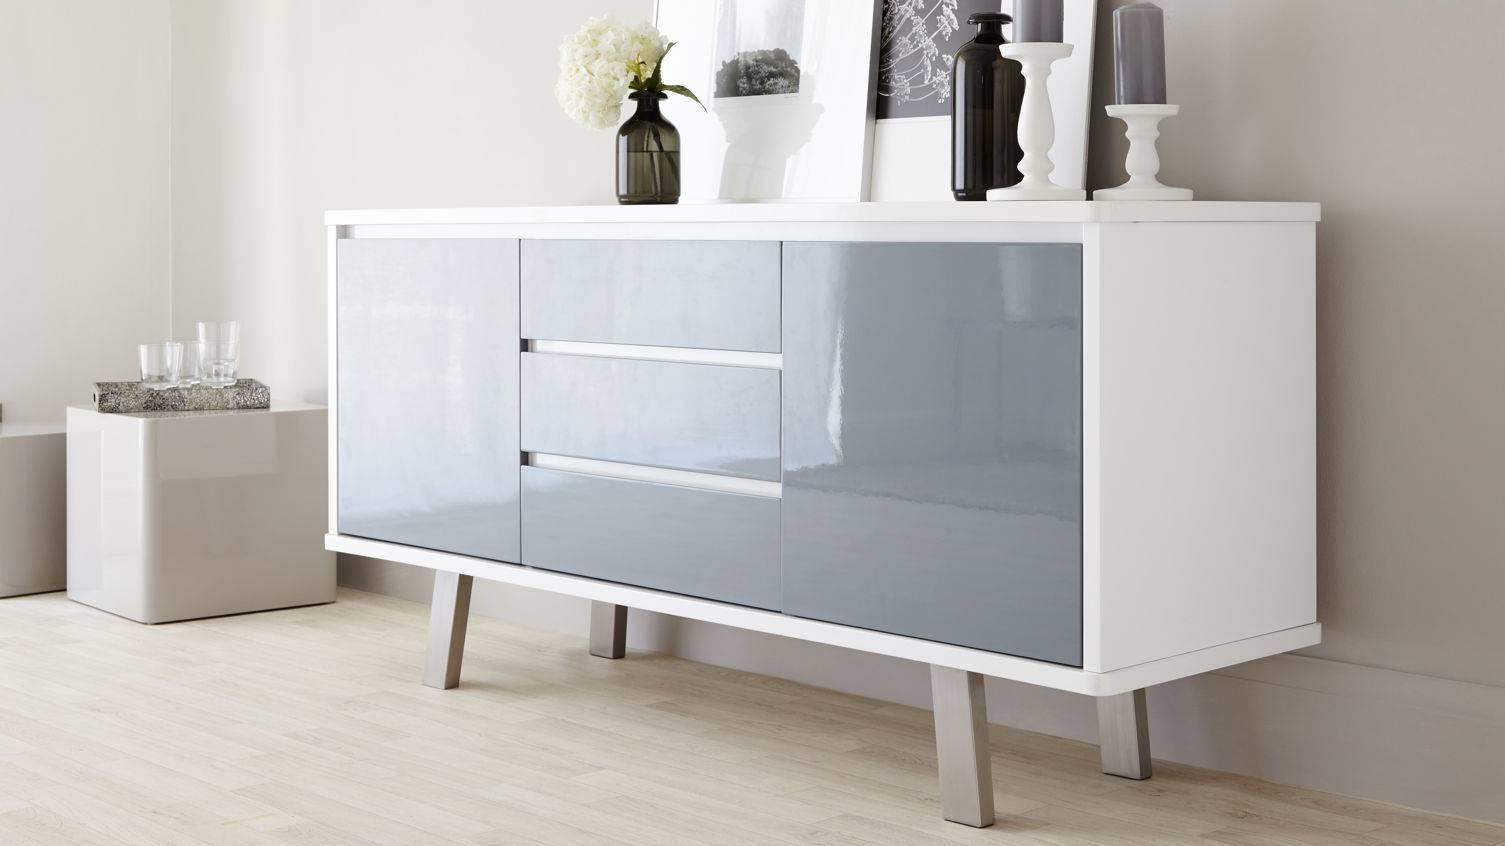 Furniture: Modern White And Grey Gloss Modern Sideboard With Throughout White Modern Sideboard (View 7 of 20)